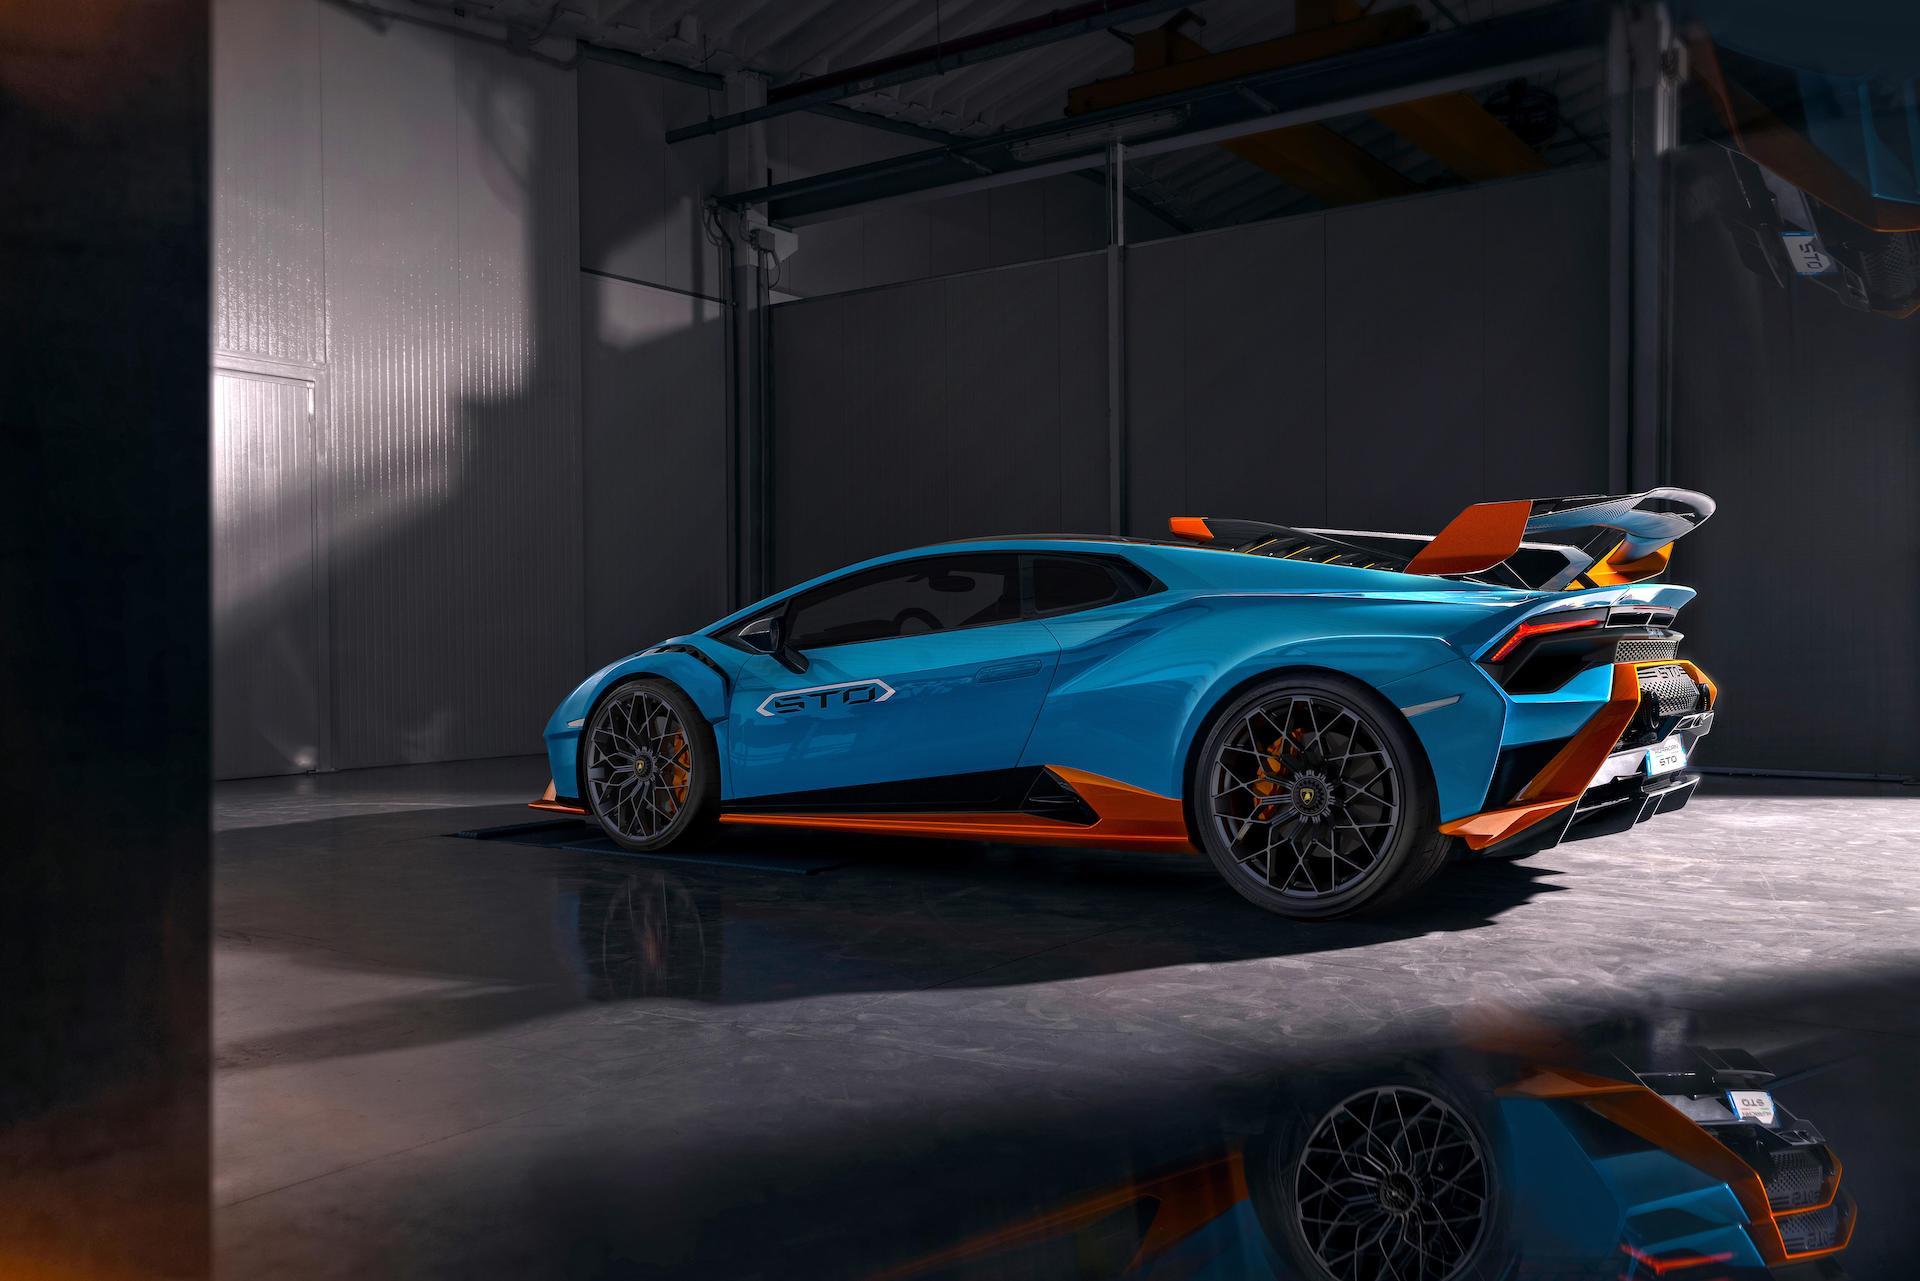 Der neue Lamborghini STO: Die Inkarnation des Squadra Corse-Erbes 6